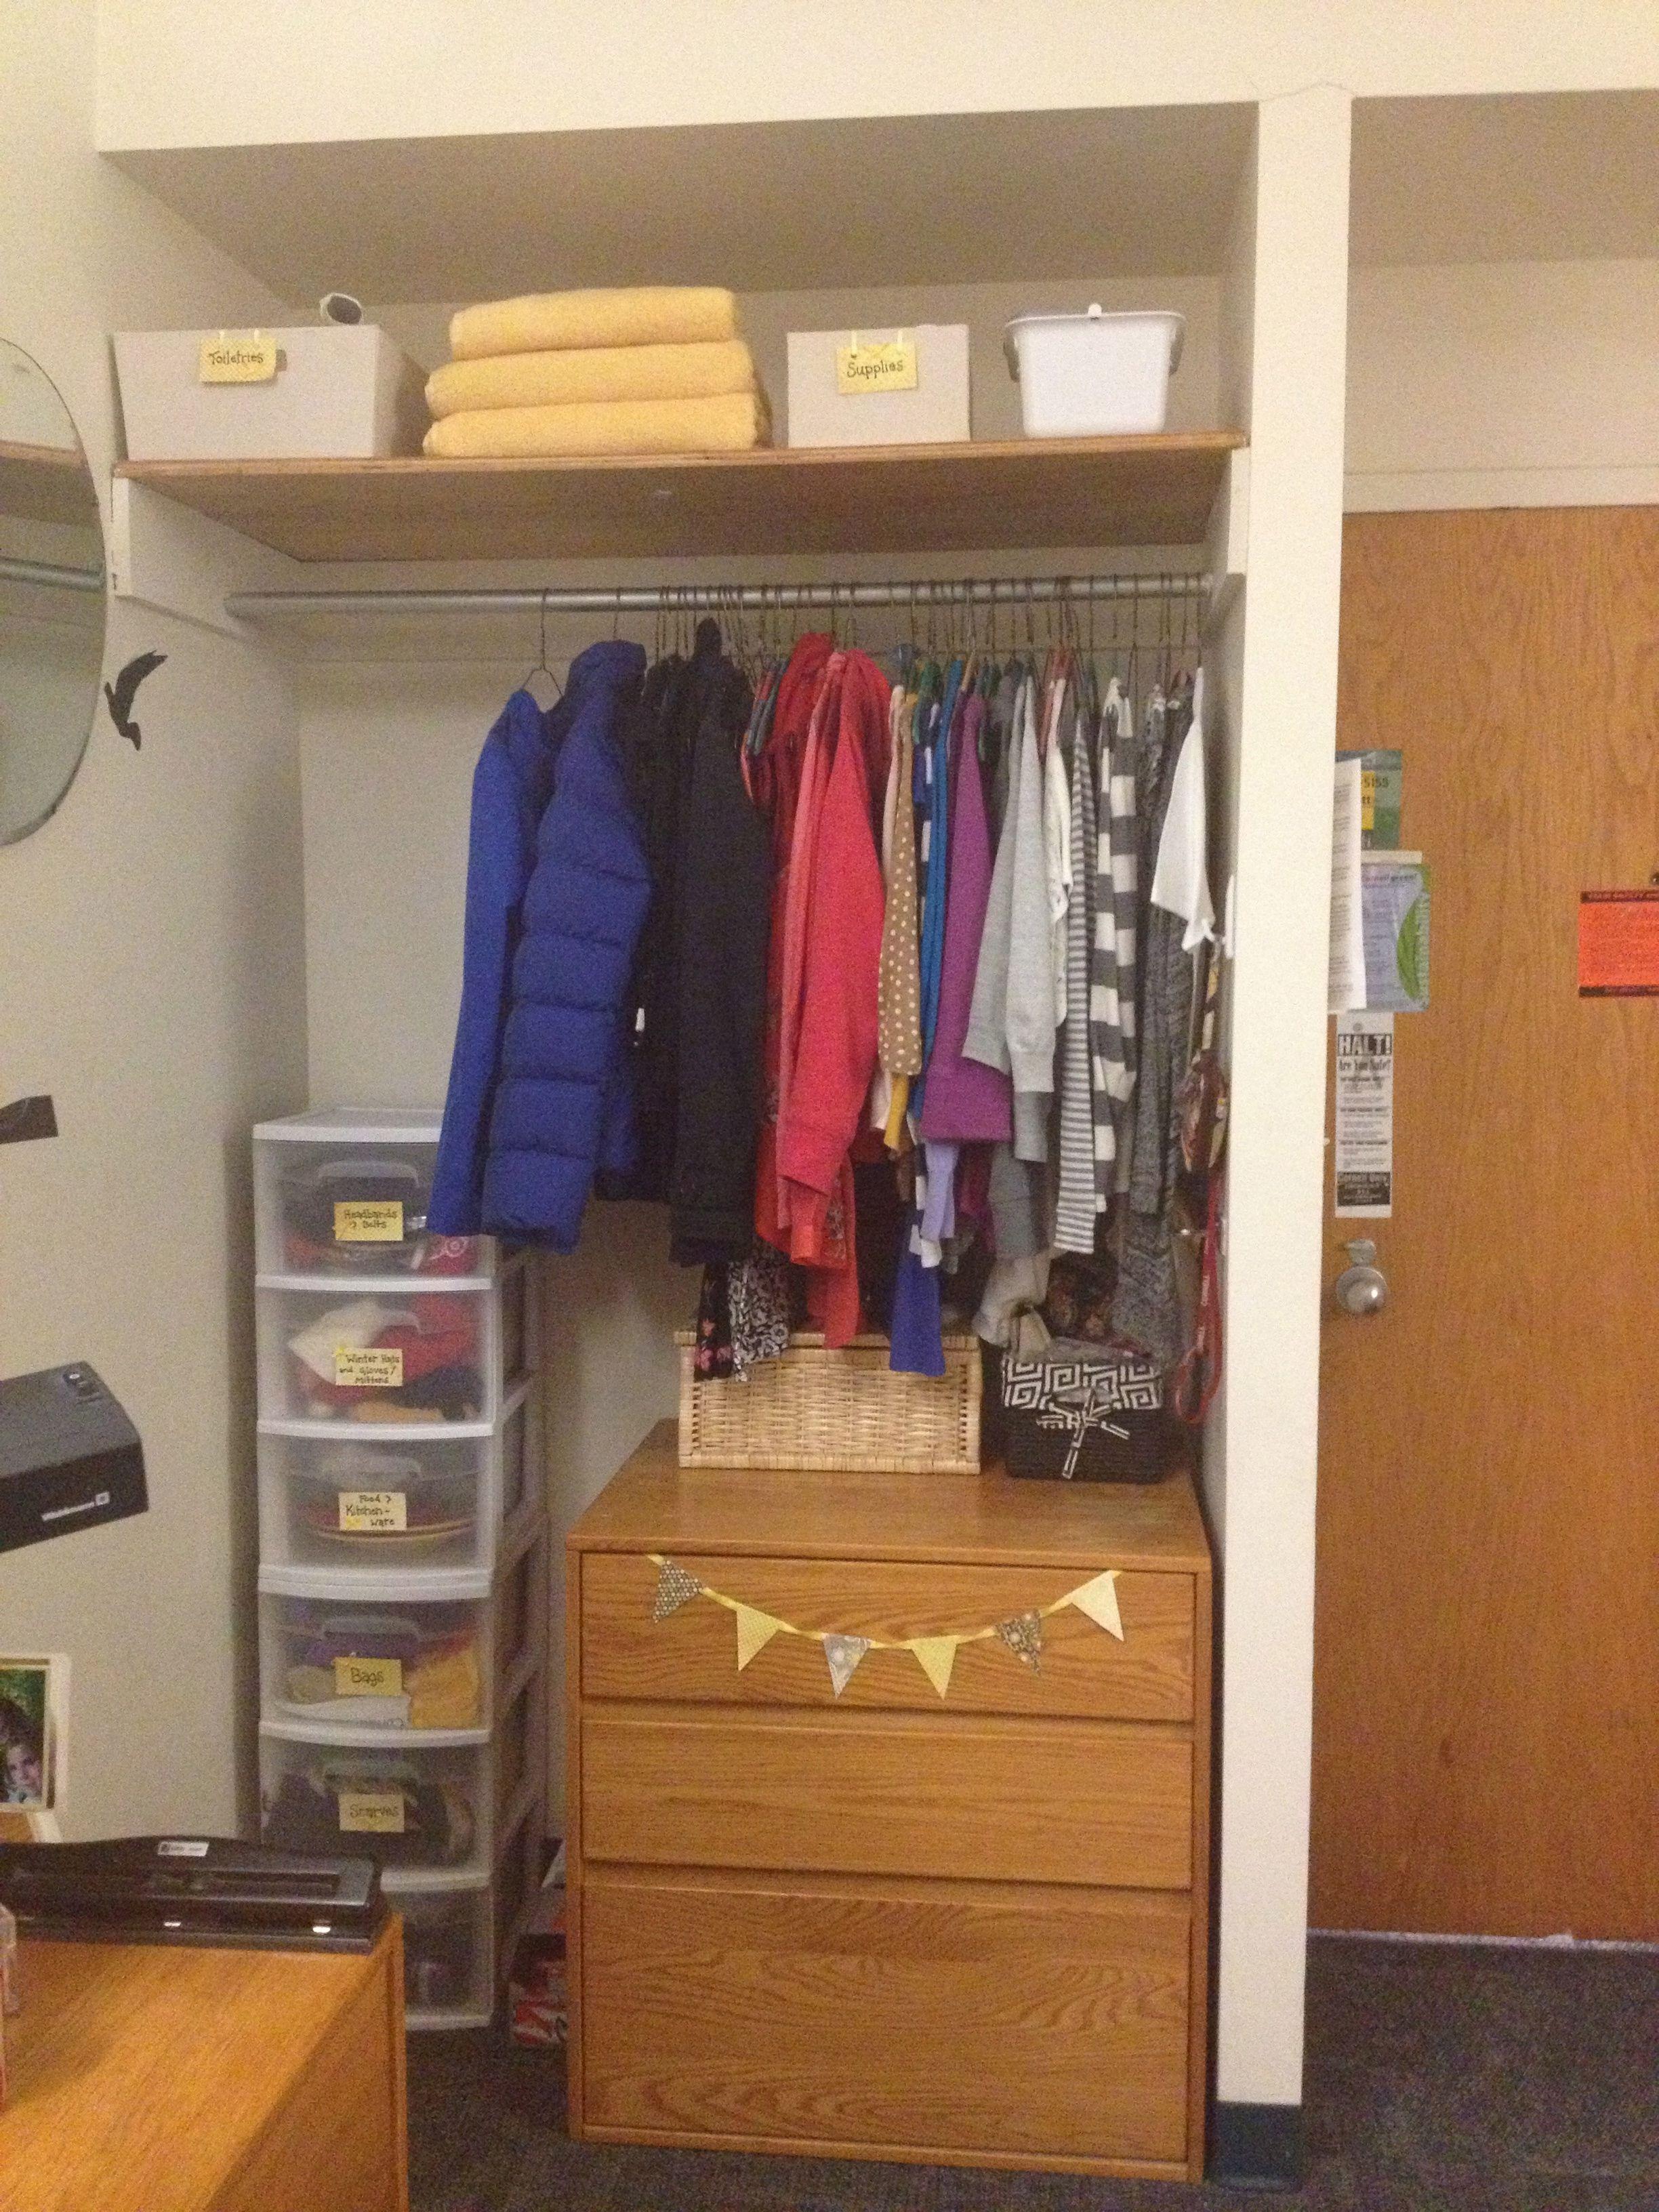 Organizing for Dormtips a small closet